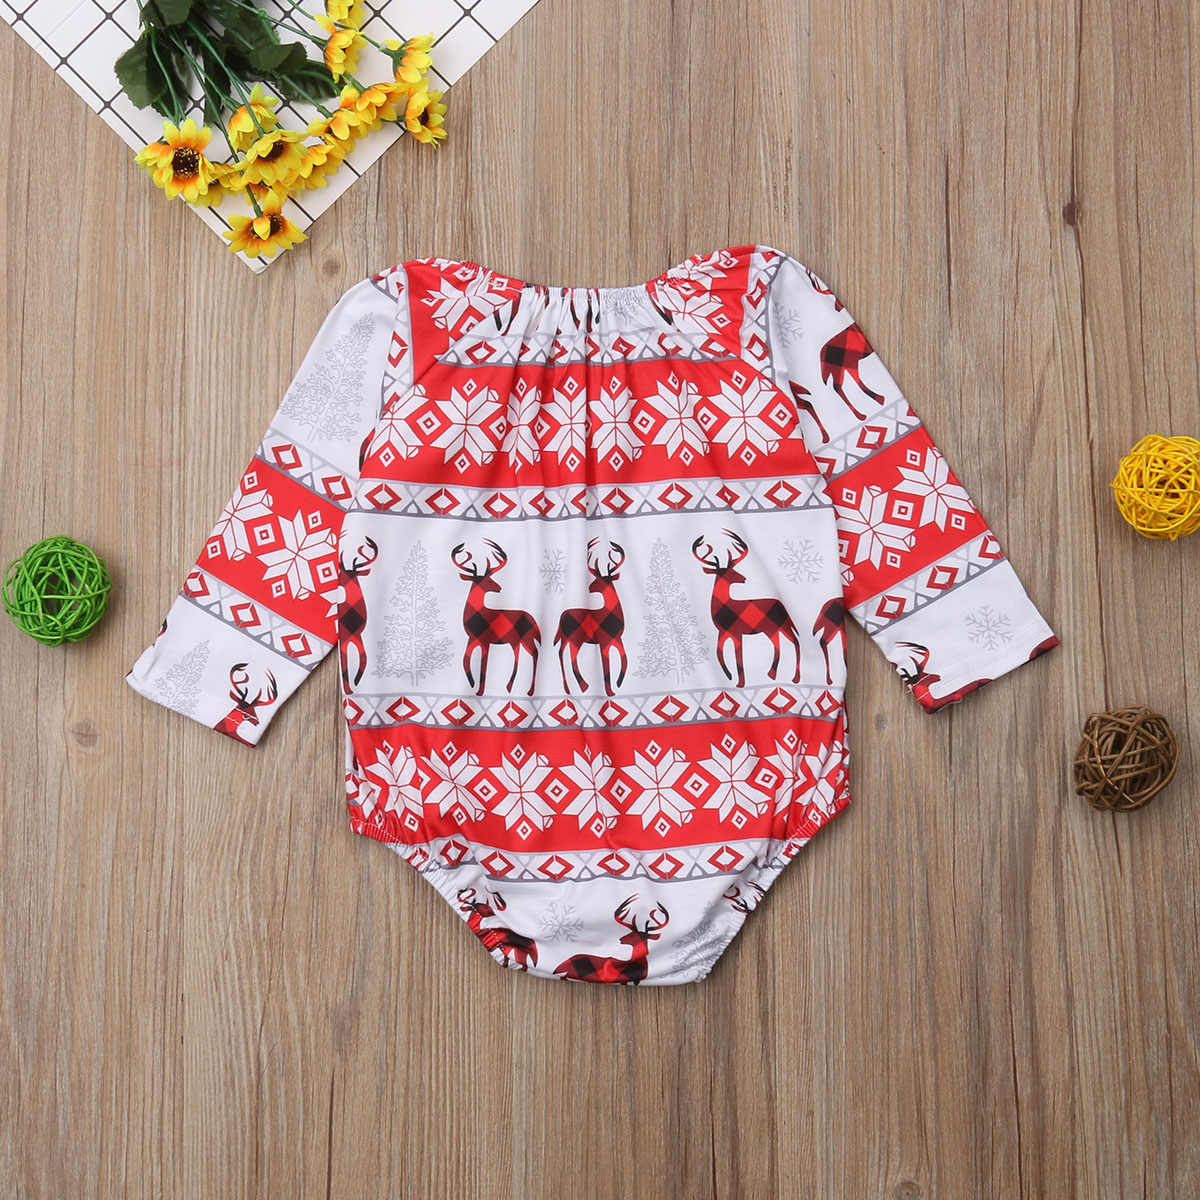 2018 Brand New Newborn Baby Girls Boys Christmas Bodysuits Long Sleeve Deer Print Jumpsuits Cotton Santa Xmas Jumpsuits 0-24M